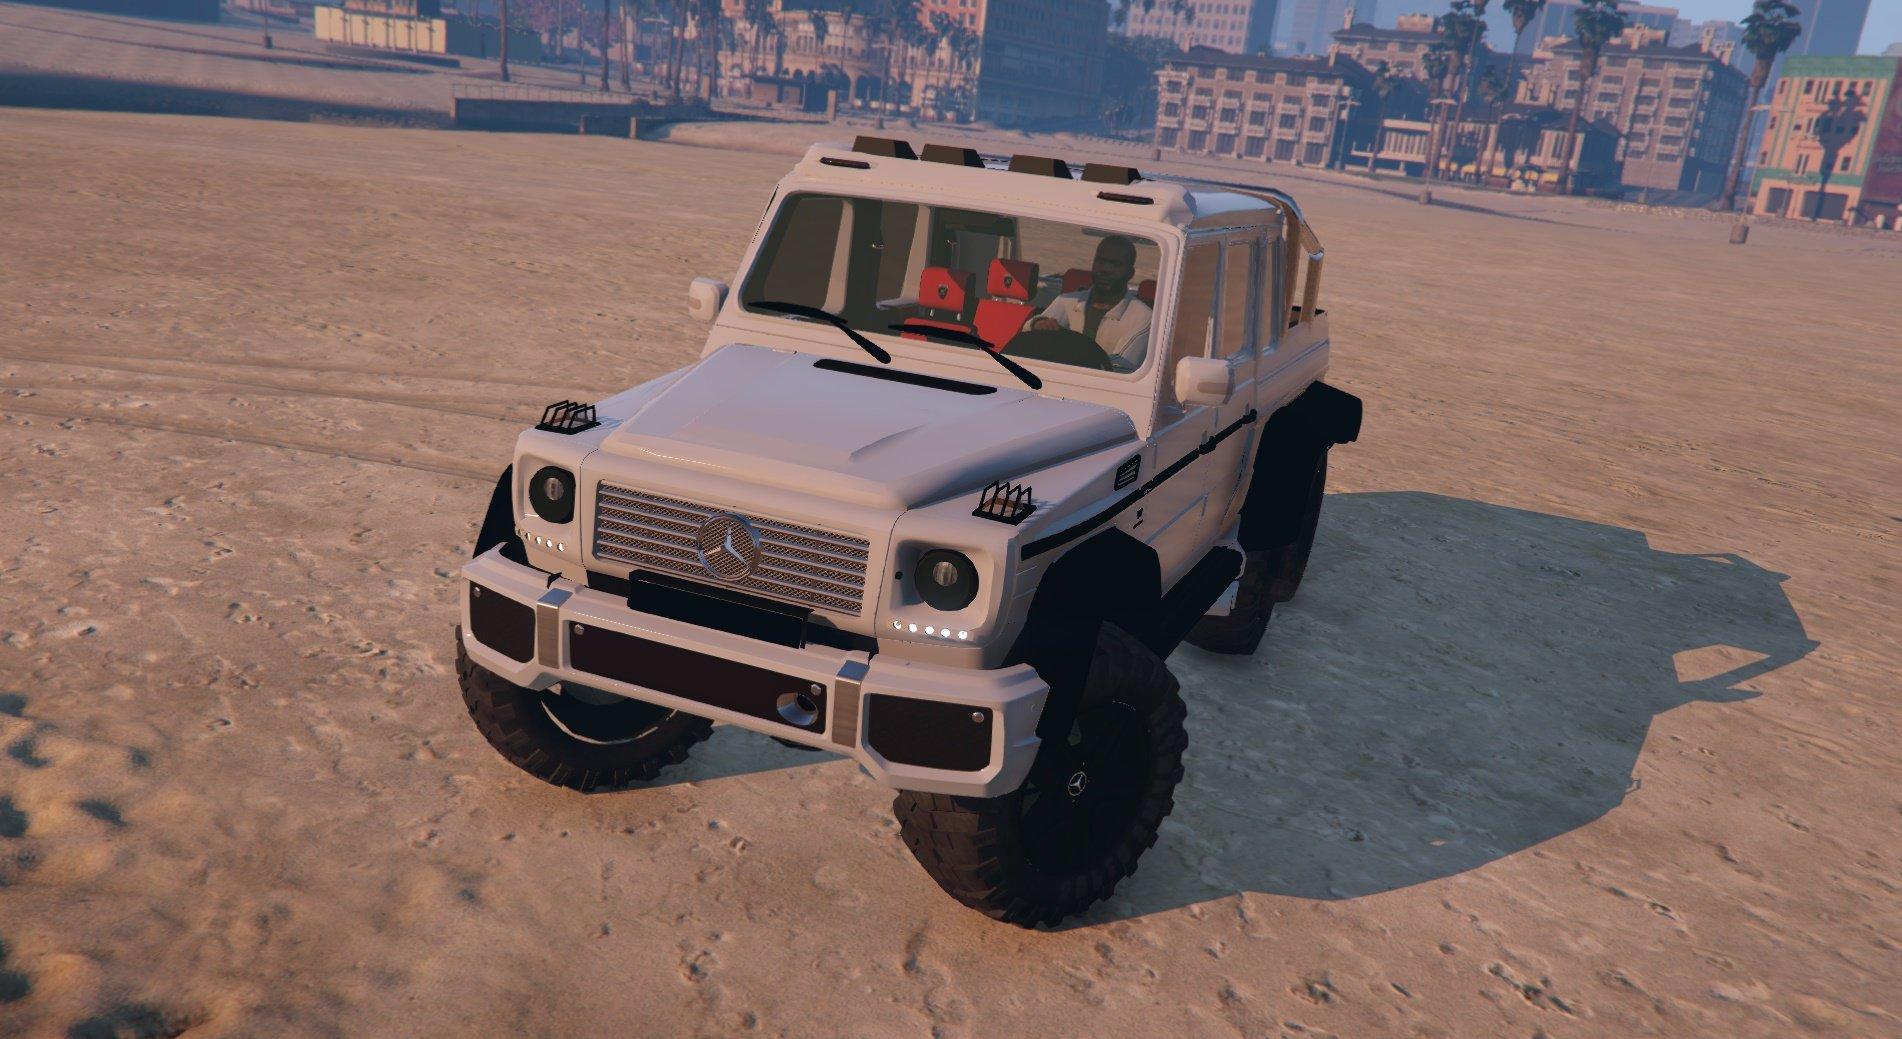 Mercedes benz g63 amg 6x6 vehicules pour gta v sur gta for Mercedes benz amg g63 6x6